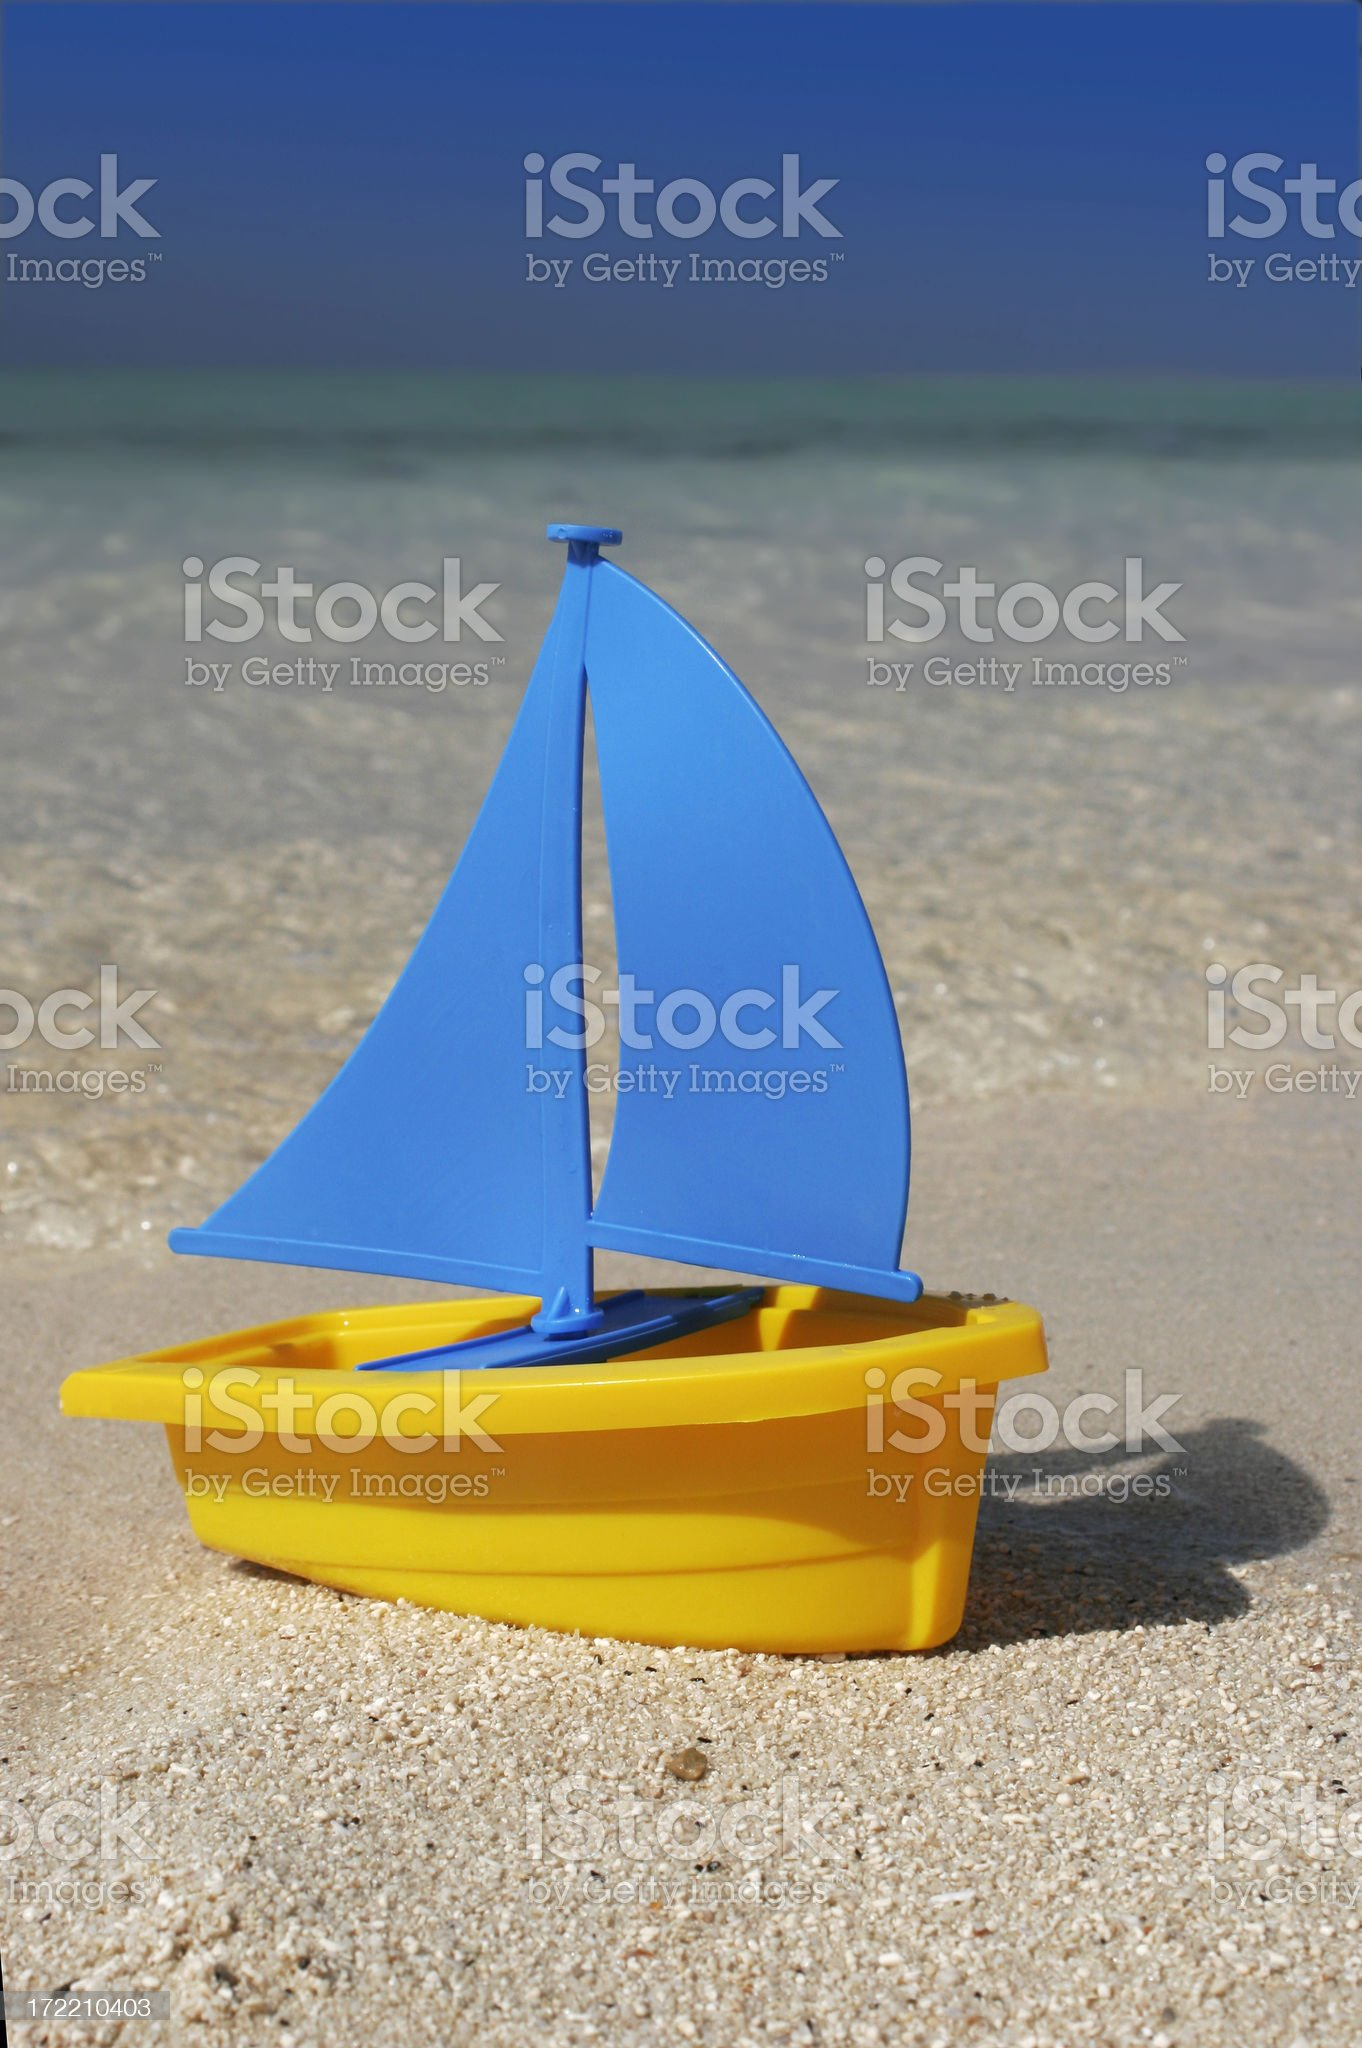 Toy Sailboat royalty-free stock photo